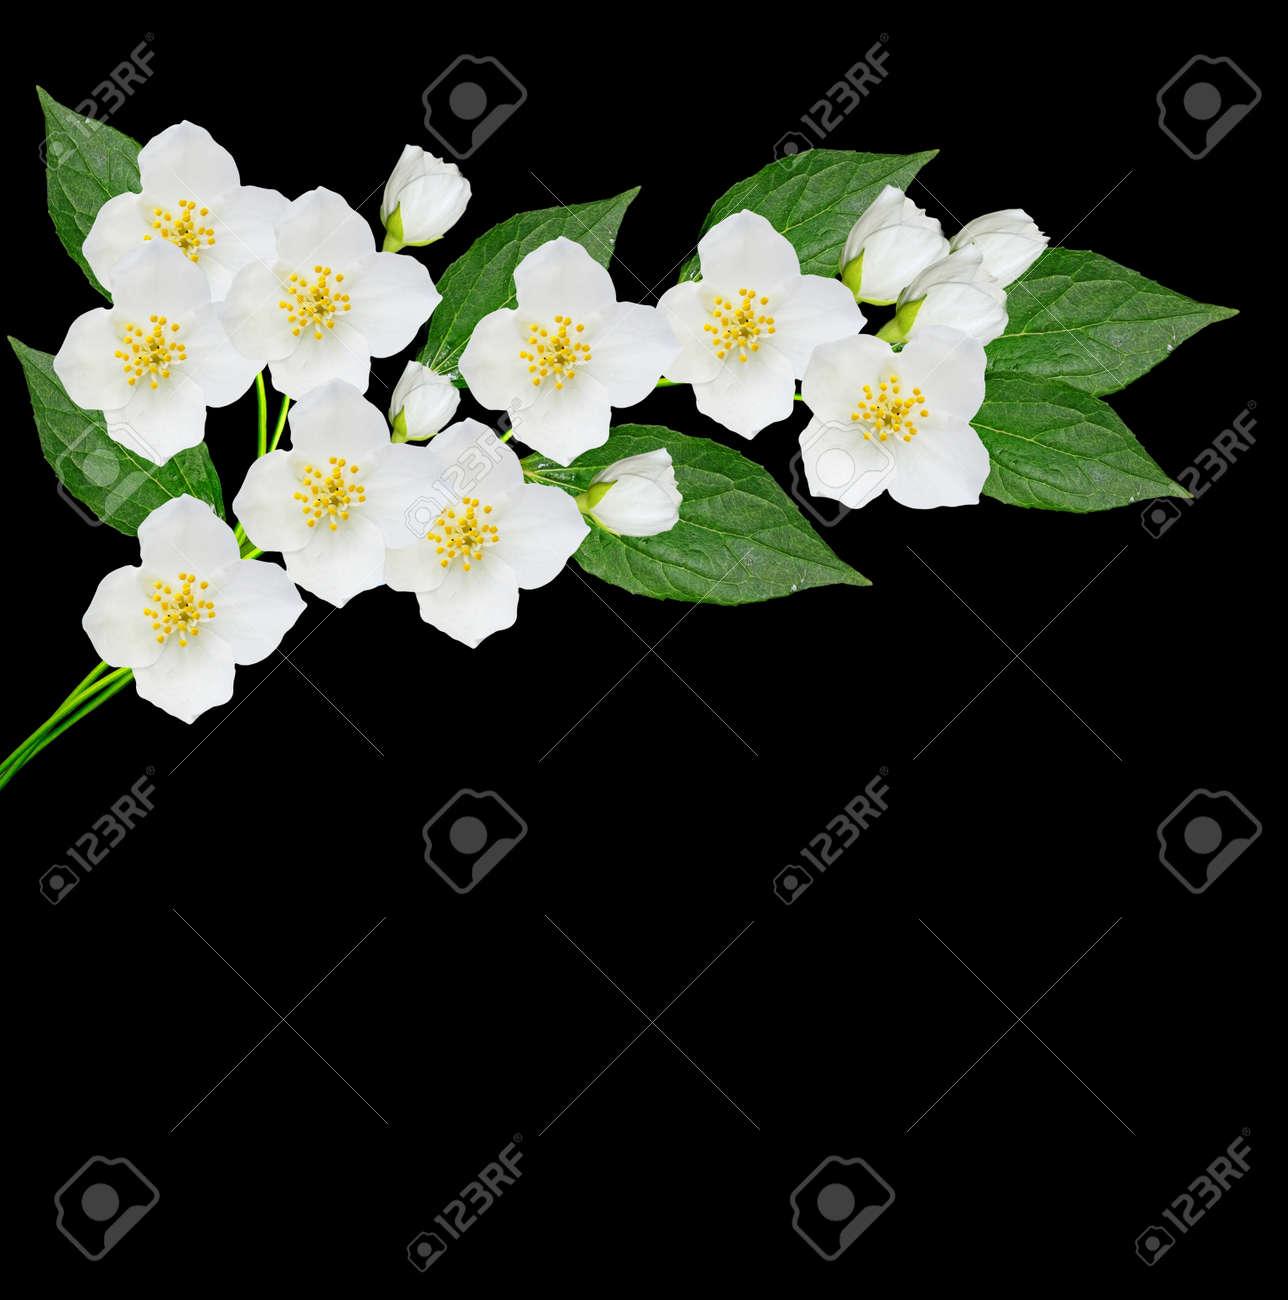 White jasmine flower branch of jasmine flowers isolated on stock stock photo white jasmine flower branch of jasmine flowers isolated on black background izmirmasajfo